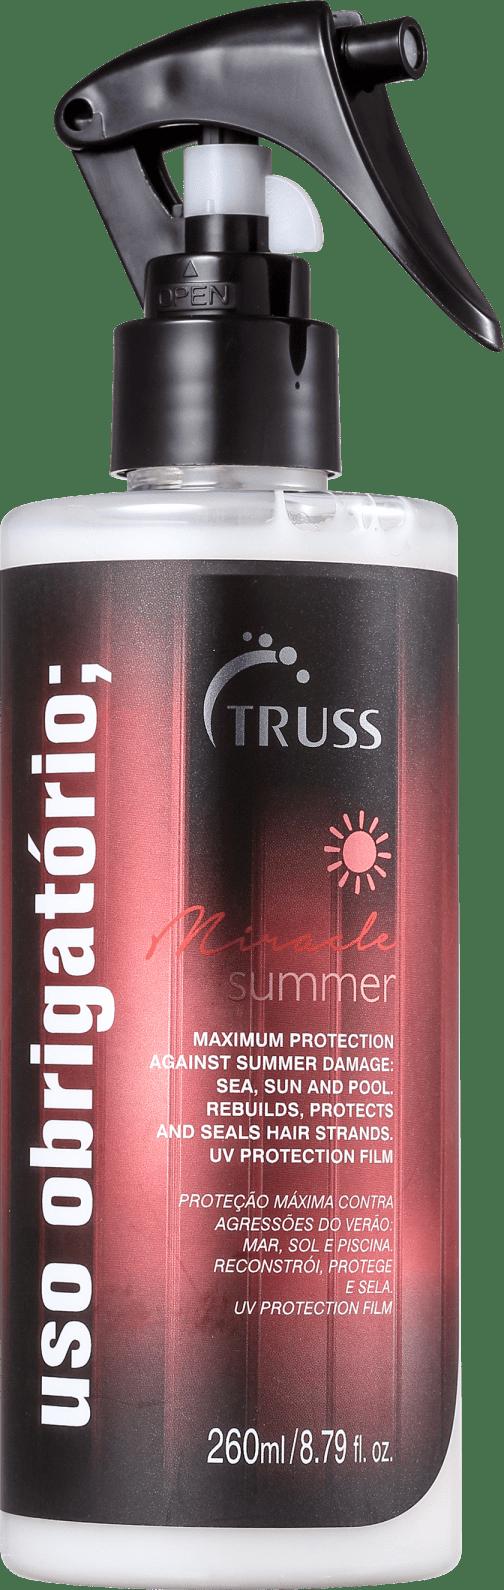 Truss Miracle Summer Uso Obrigatório - Tratamento Reconstrutor 260ml